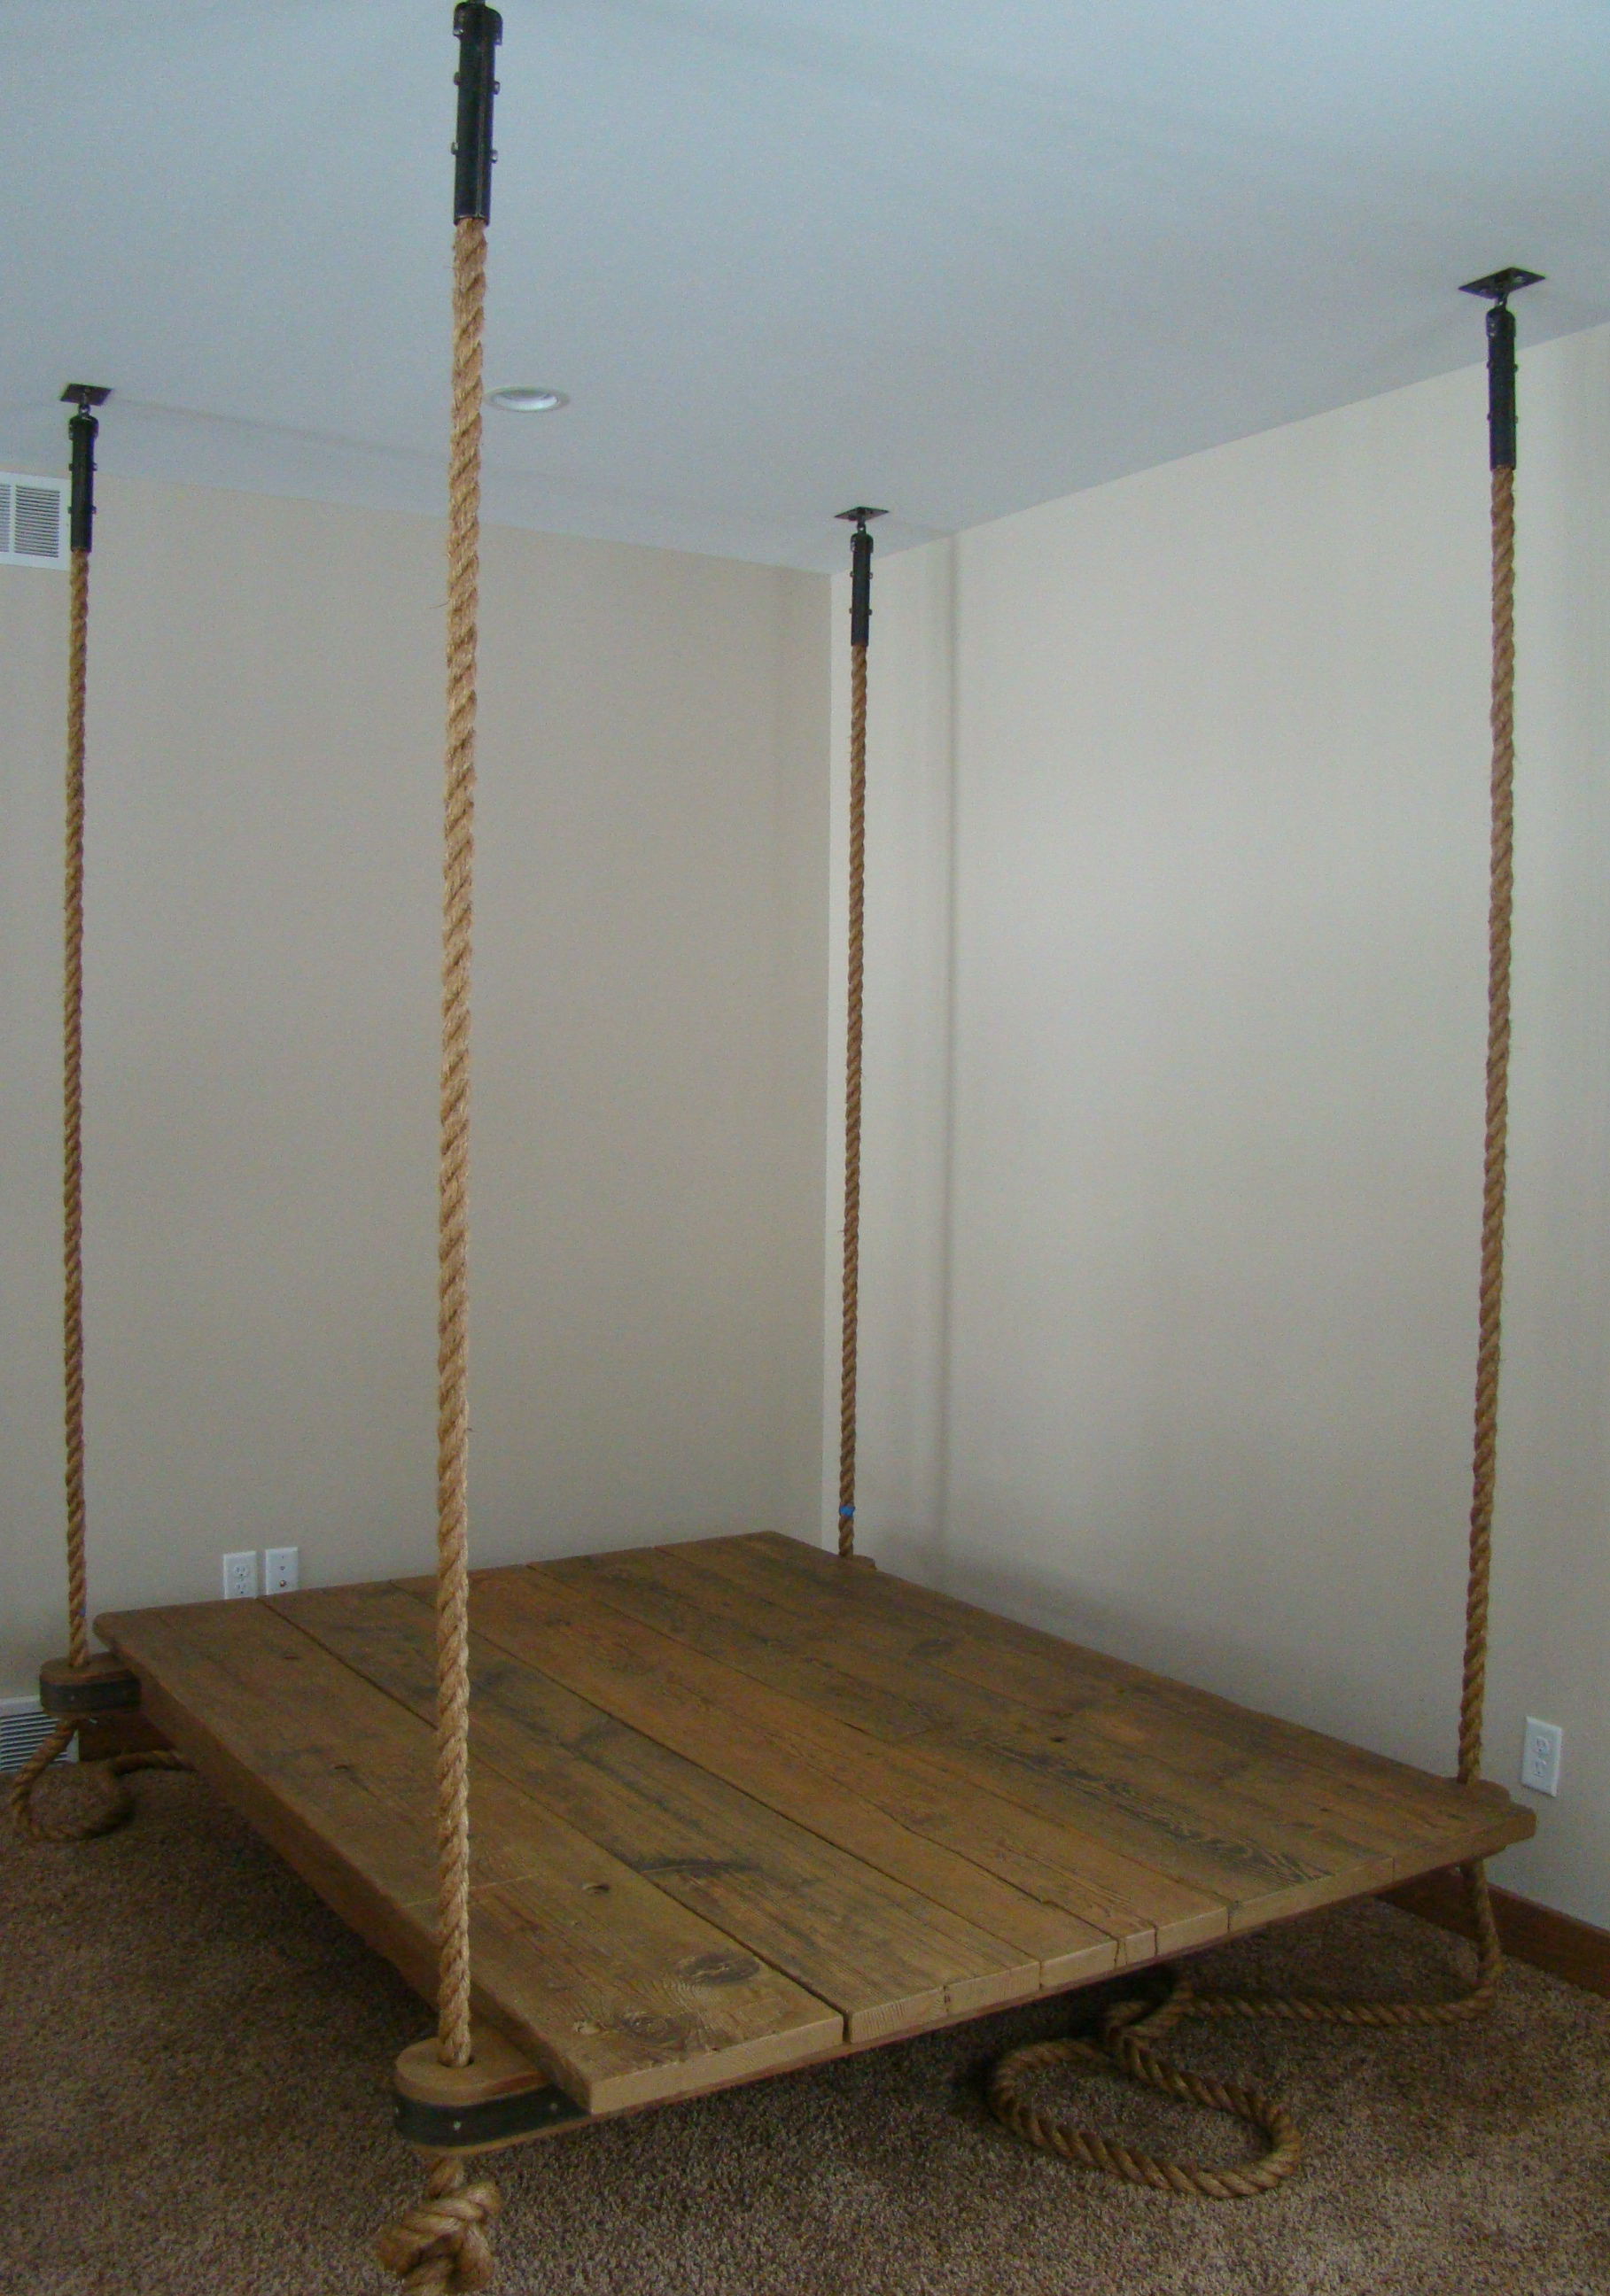 Trampoline bed tumblr - New Hanging Bed Preview Ben Riddering Shop Blog